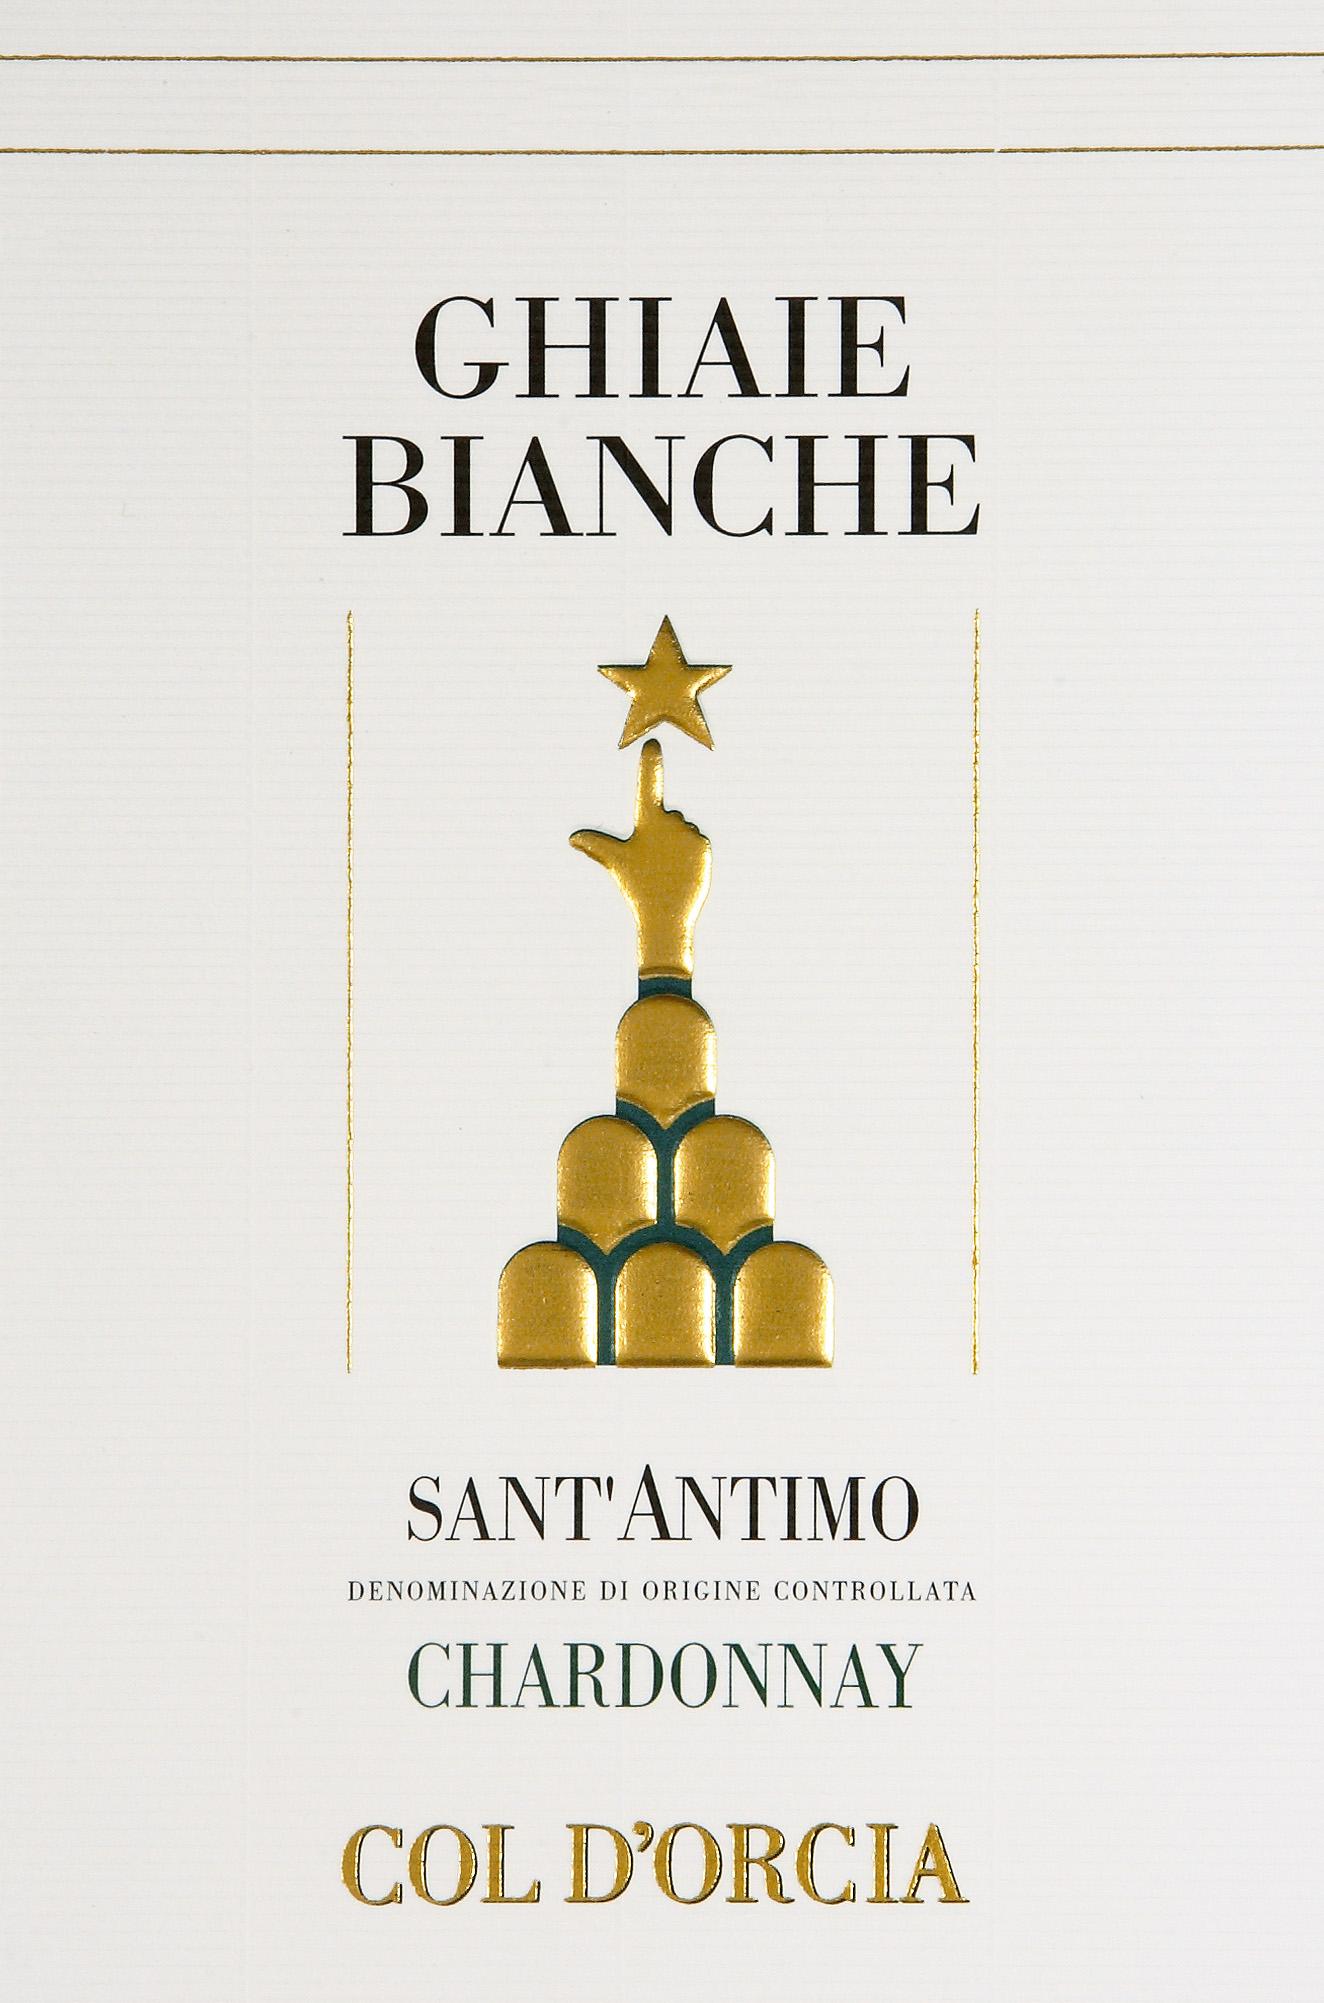 科尔多奇亚圣安蒂莫白砾石霞多丽干白Col d'Orcia Ghiaie Bianche Sant'Antimo Chardonnay